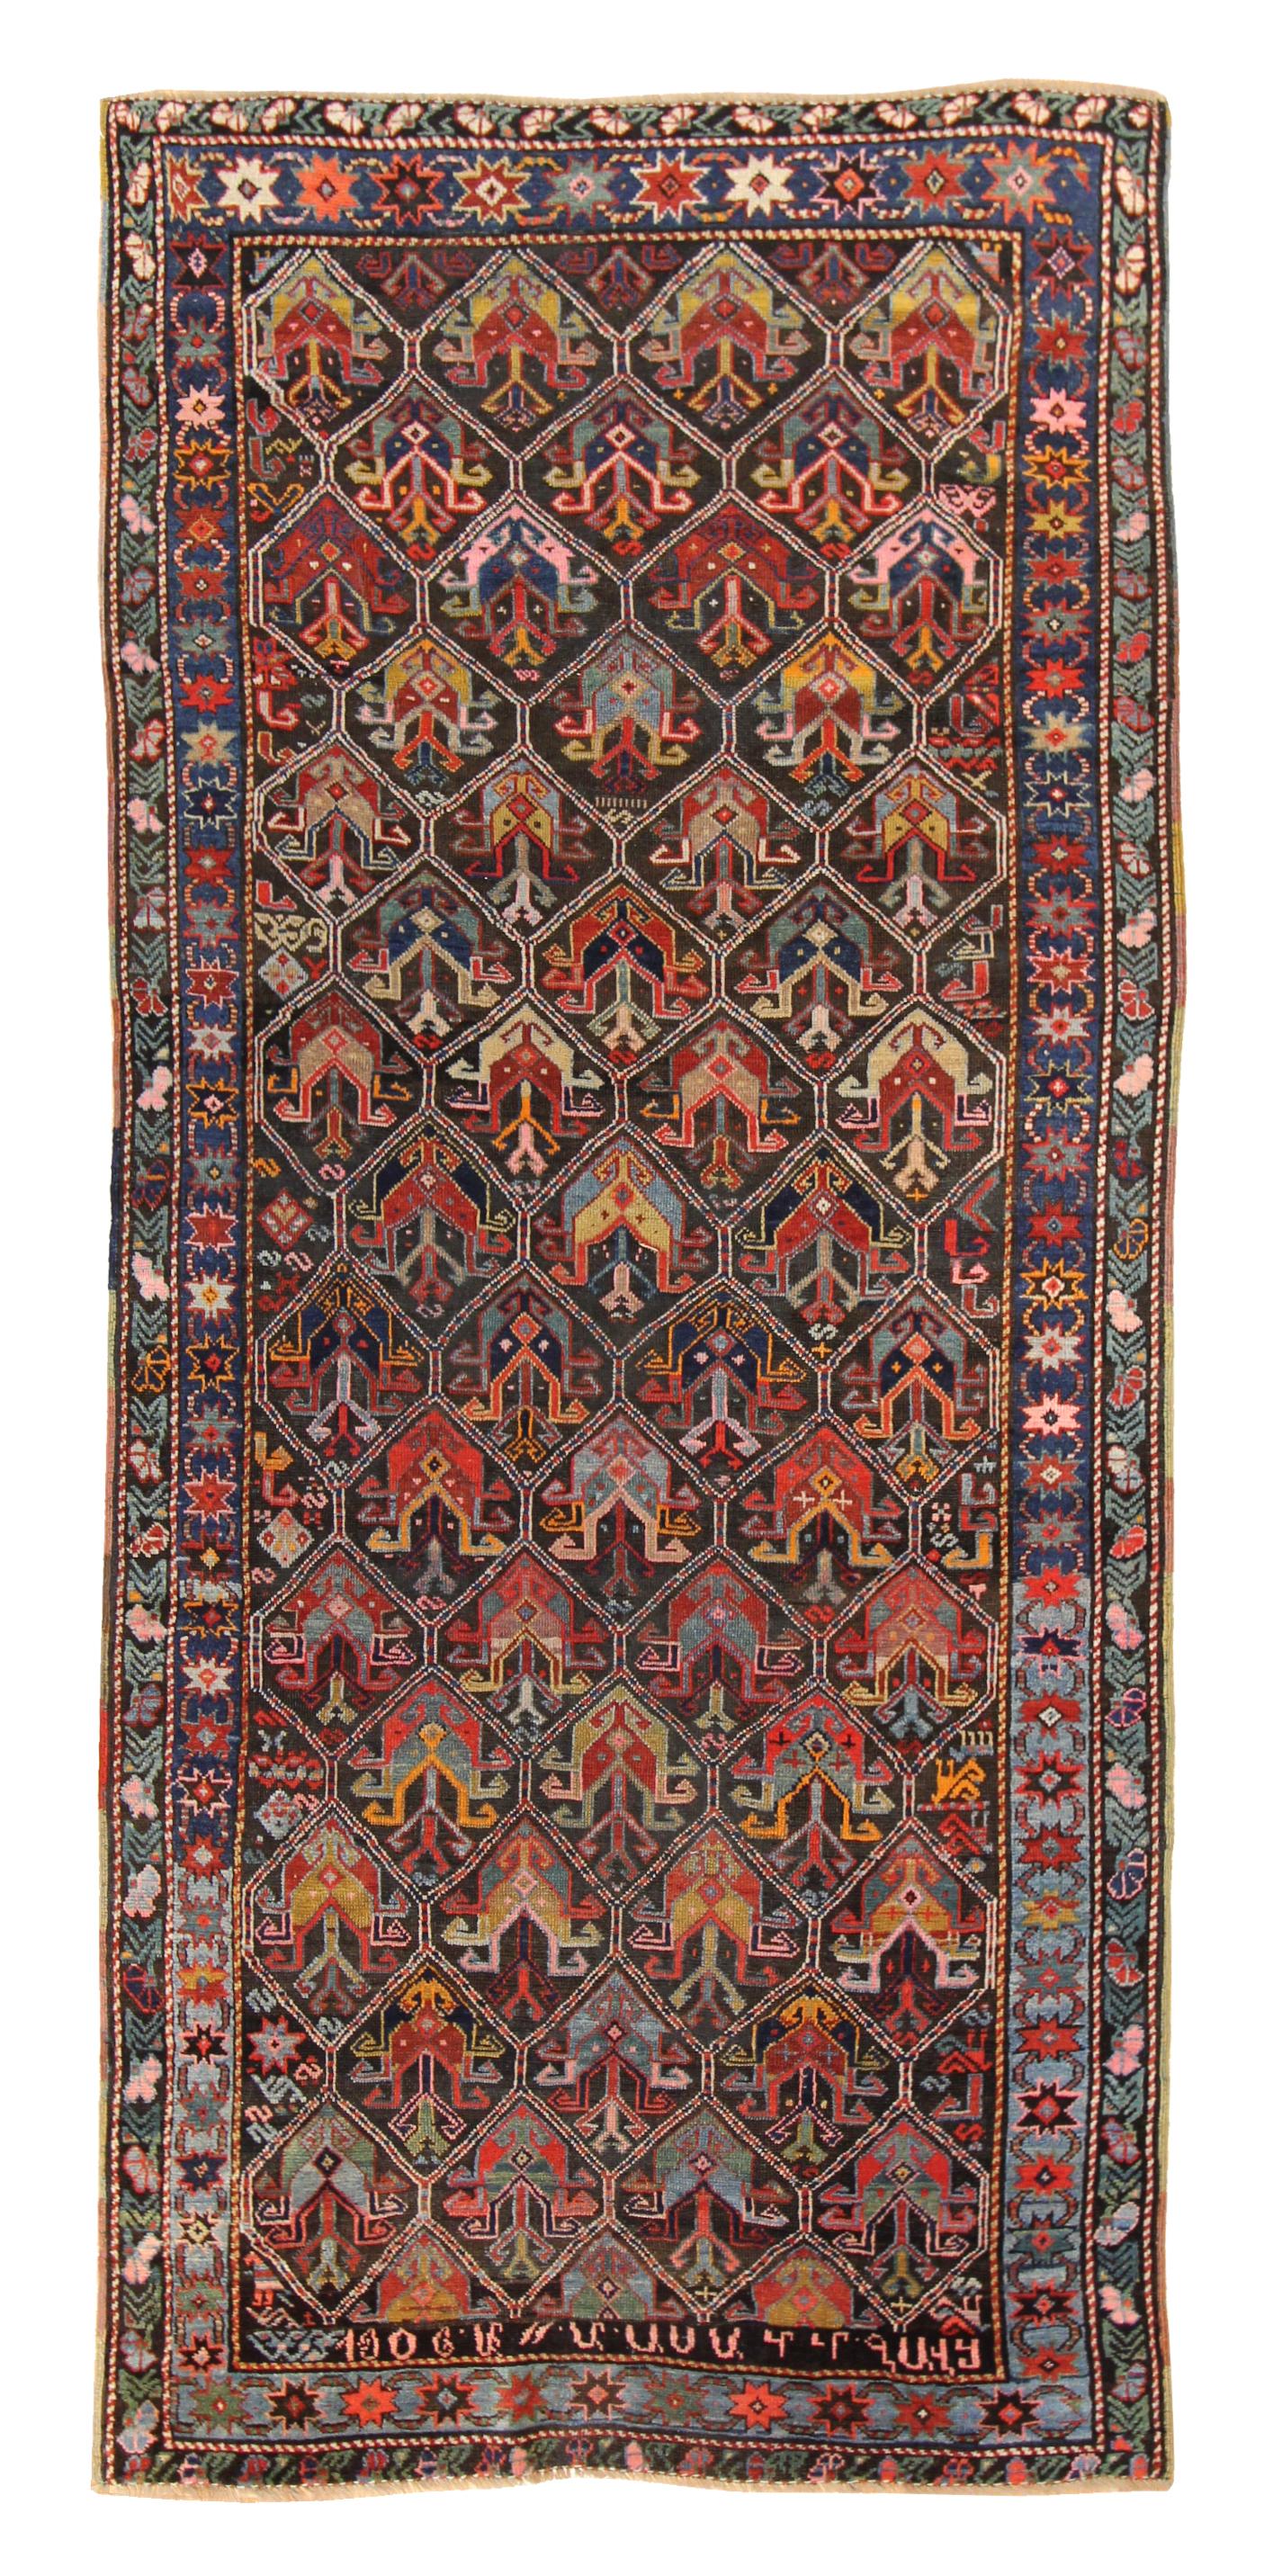 524 Tulip Karabagh, dated 1906, 4'x9'